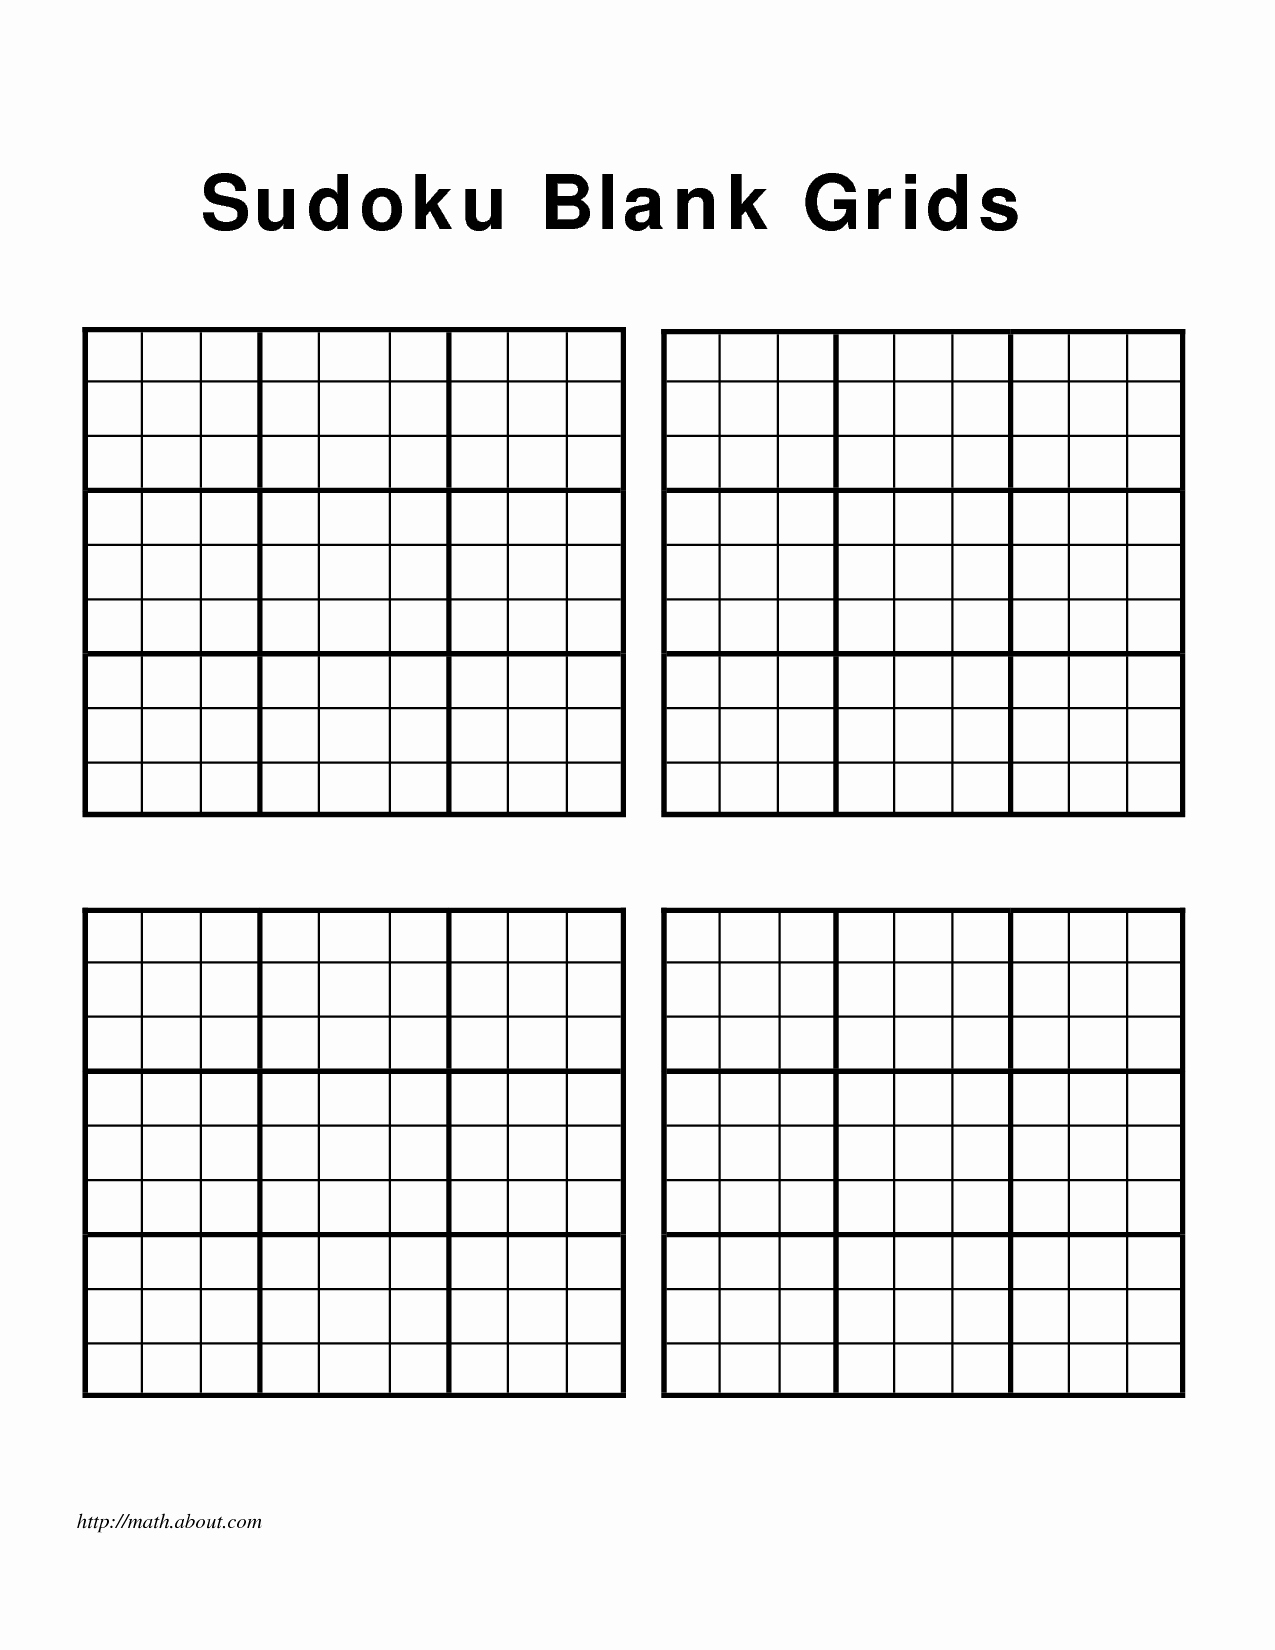 Blank Sudoku Grid Printable Luxury Blank Sudoku form Print